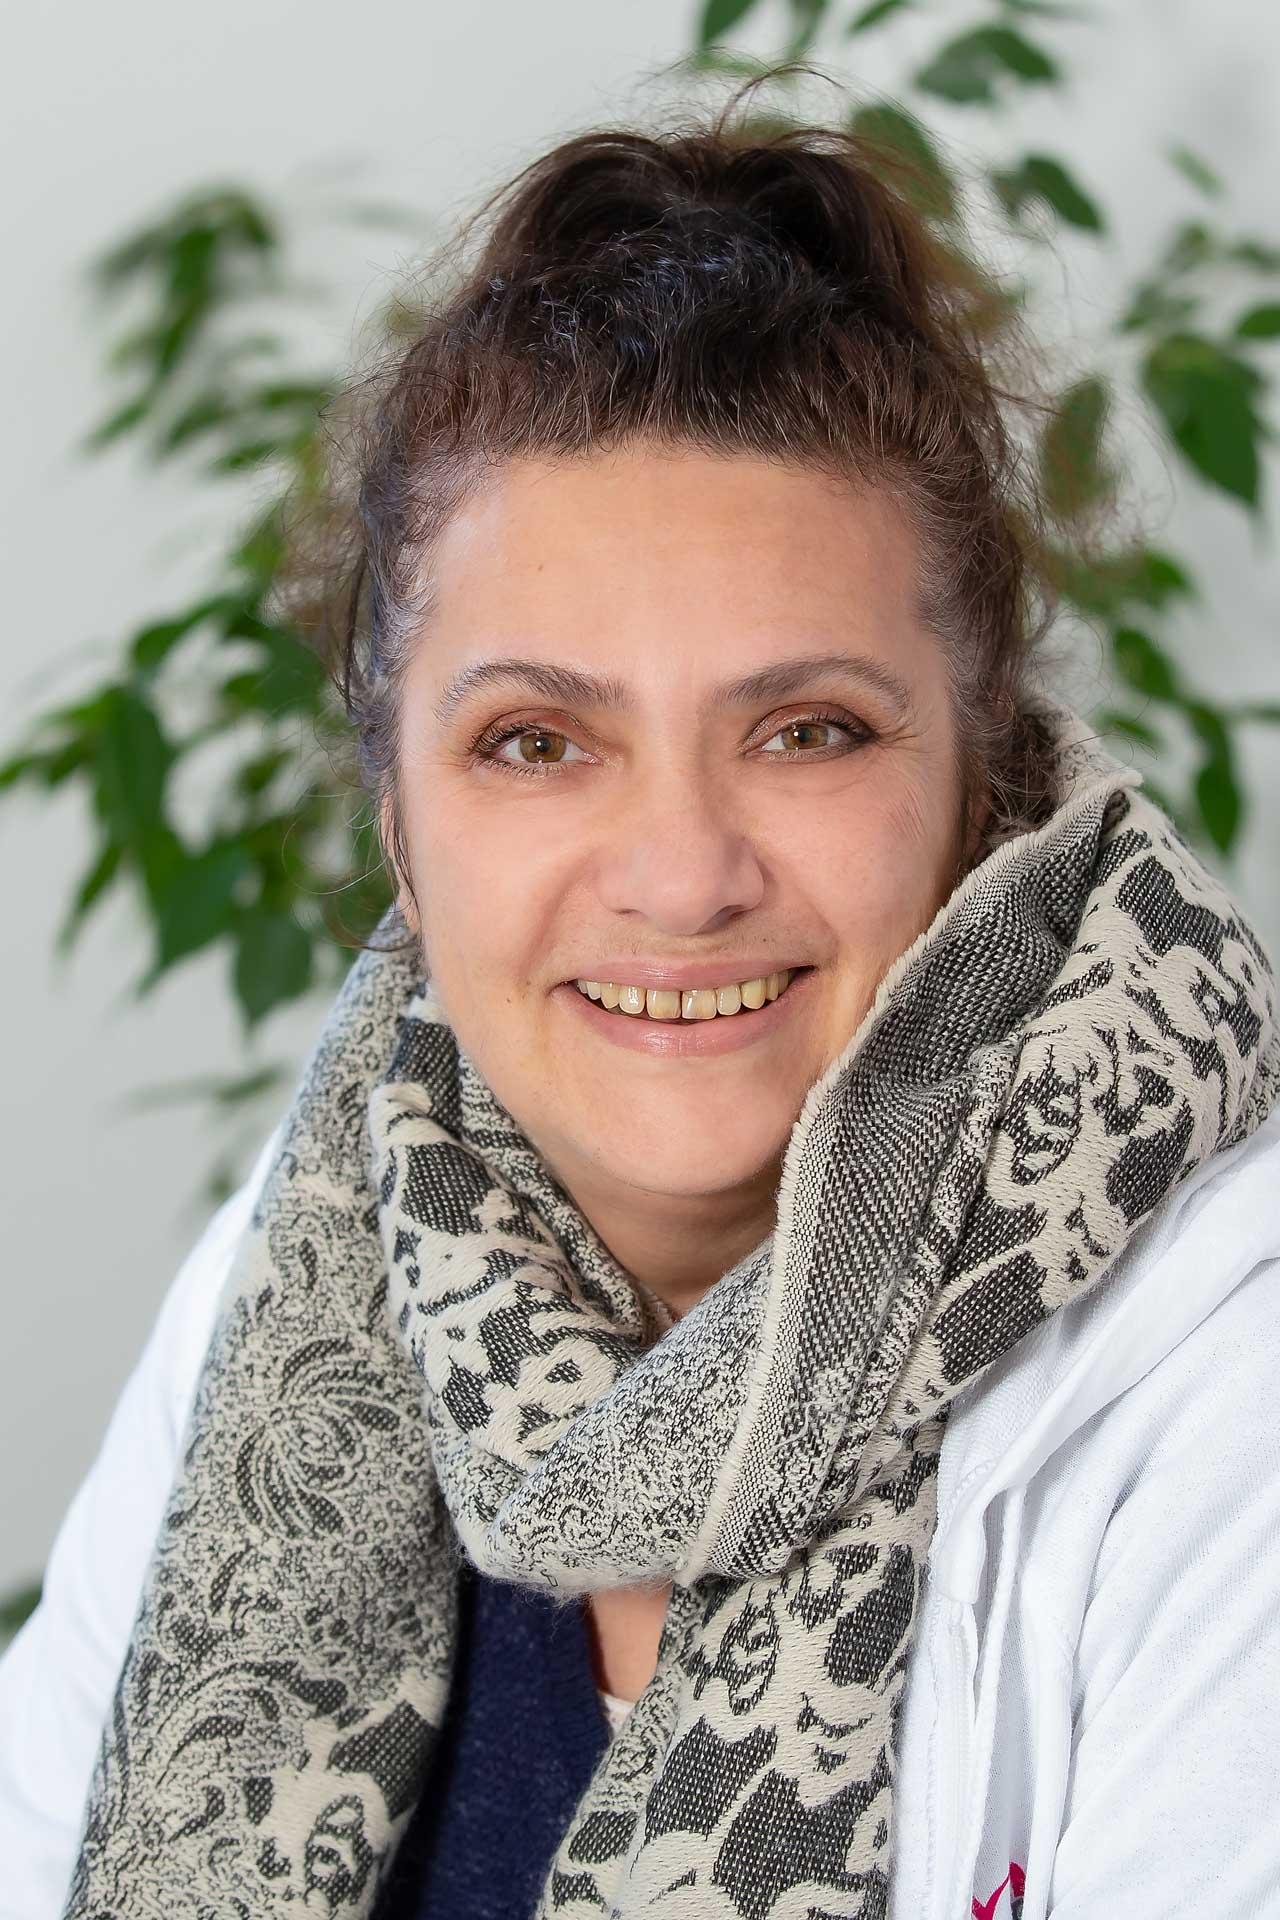 Vanya Asenova